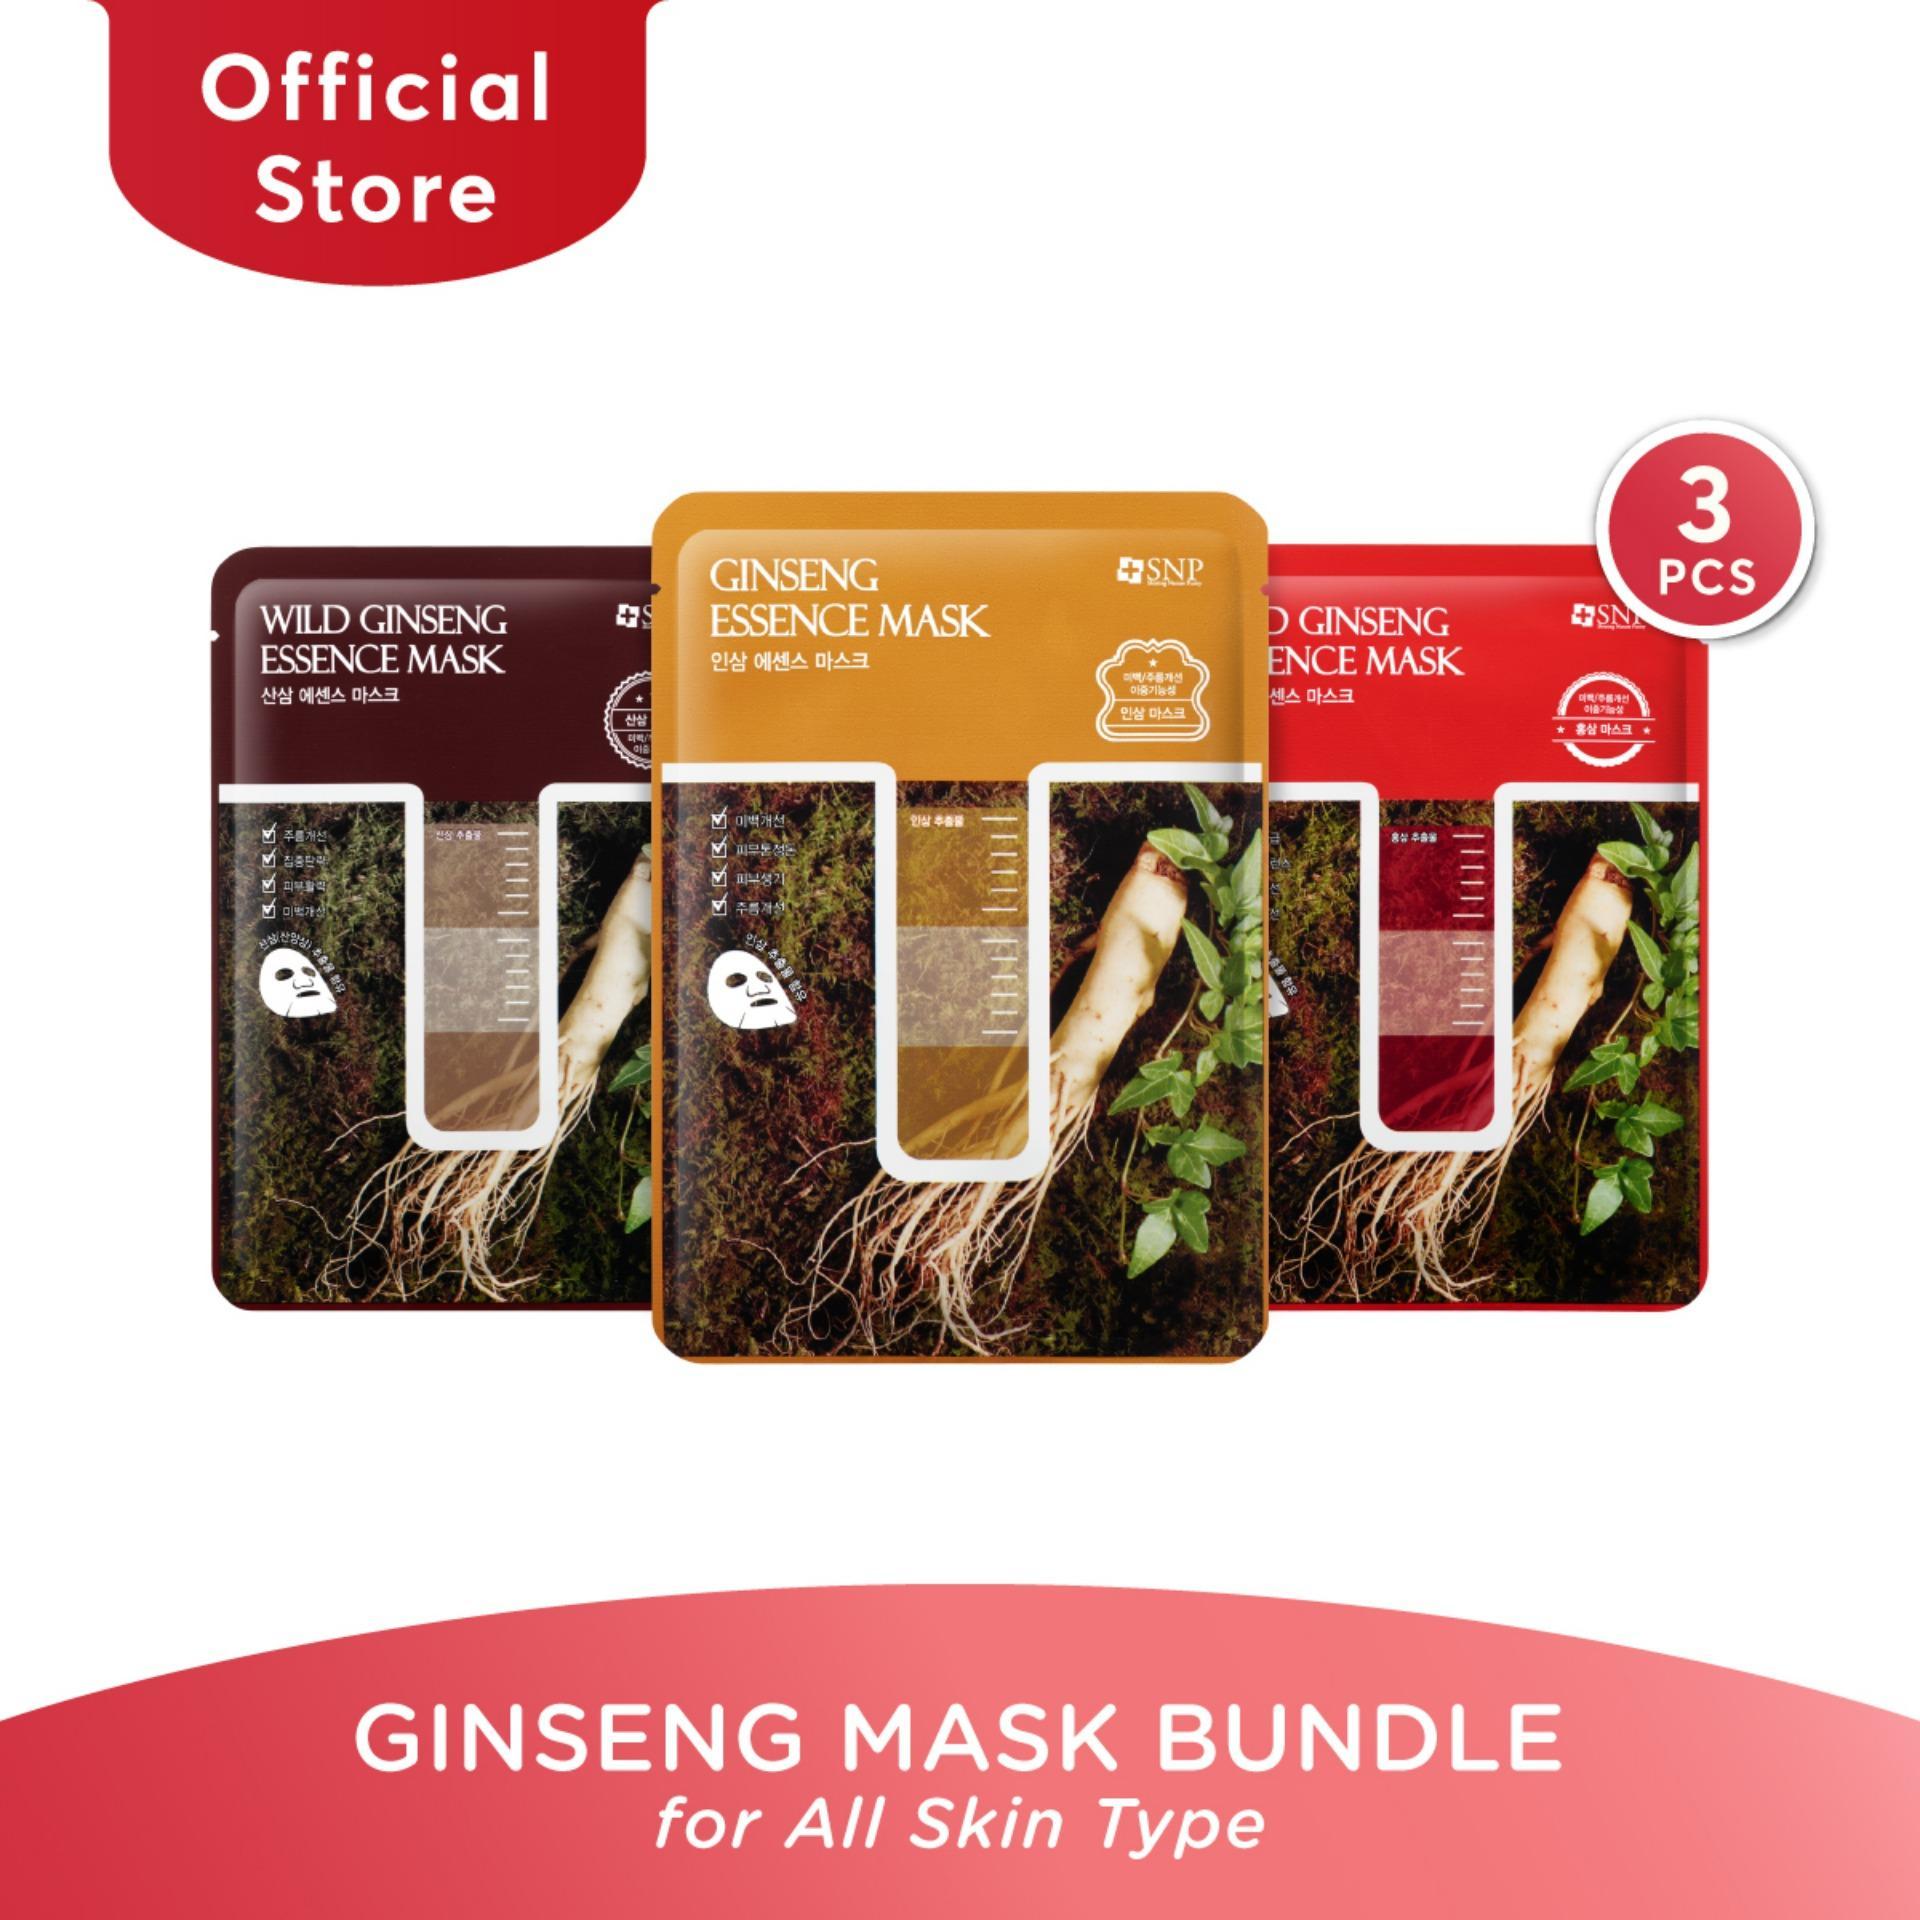 SNP Ginseng Mask Bundle